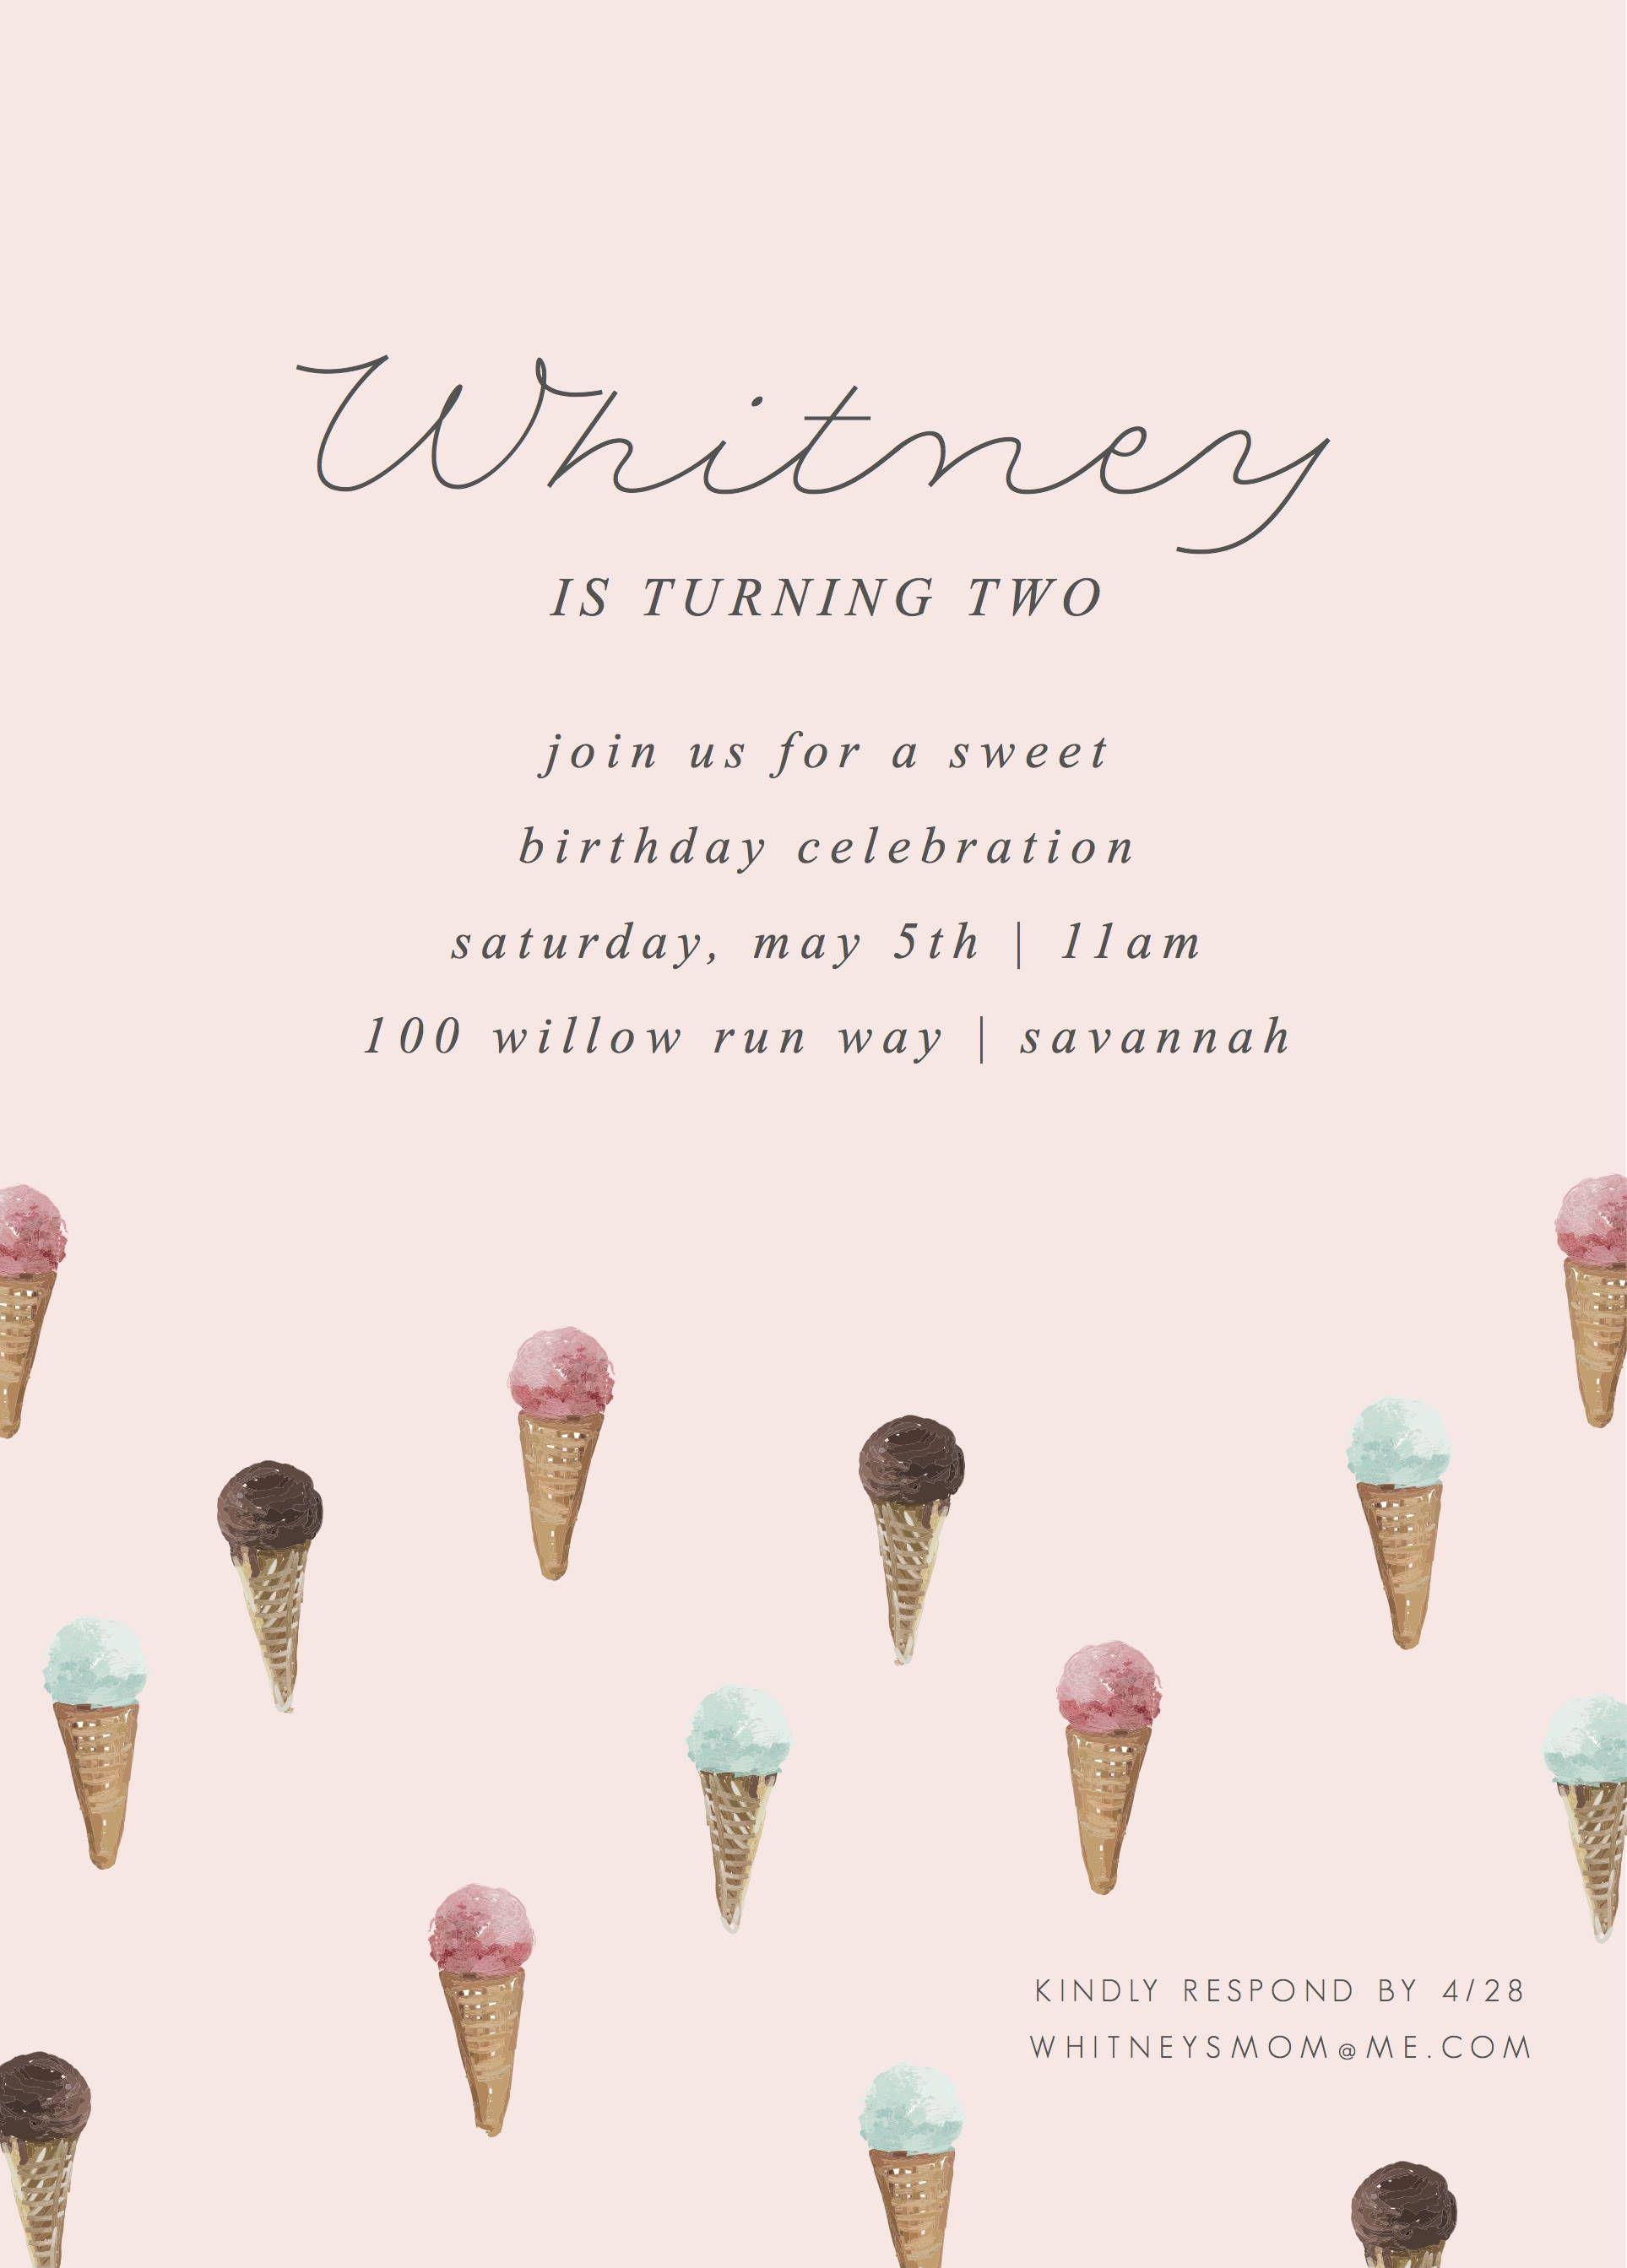 Ice Cream Social Birthday Invitation W Photo Ice Cream Etsy Ice Cream Party Invitations Ice Cream Social Invitations Ice Cream Invitation